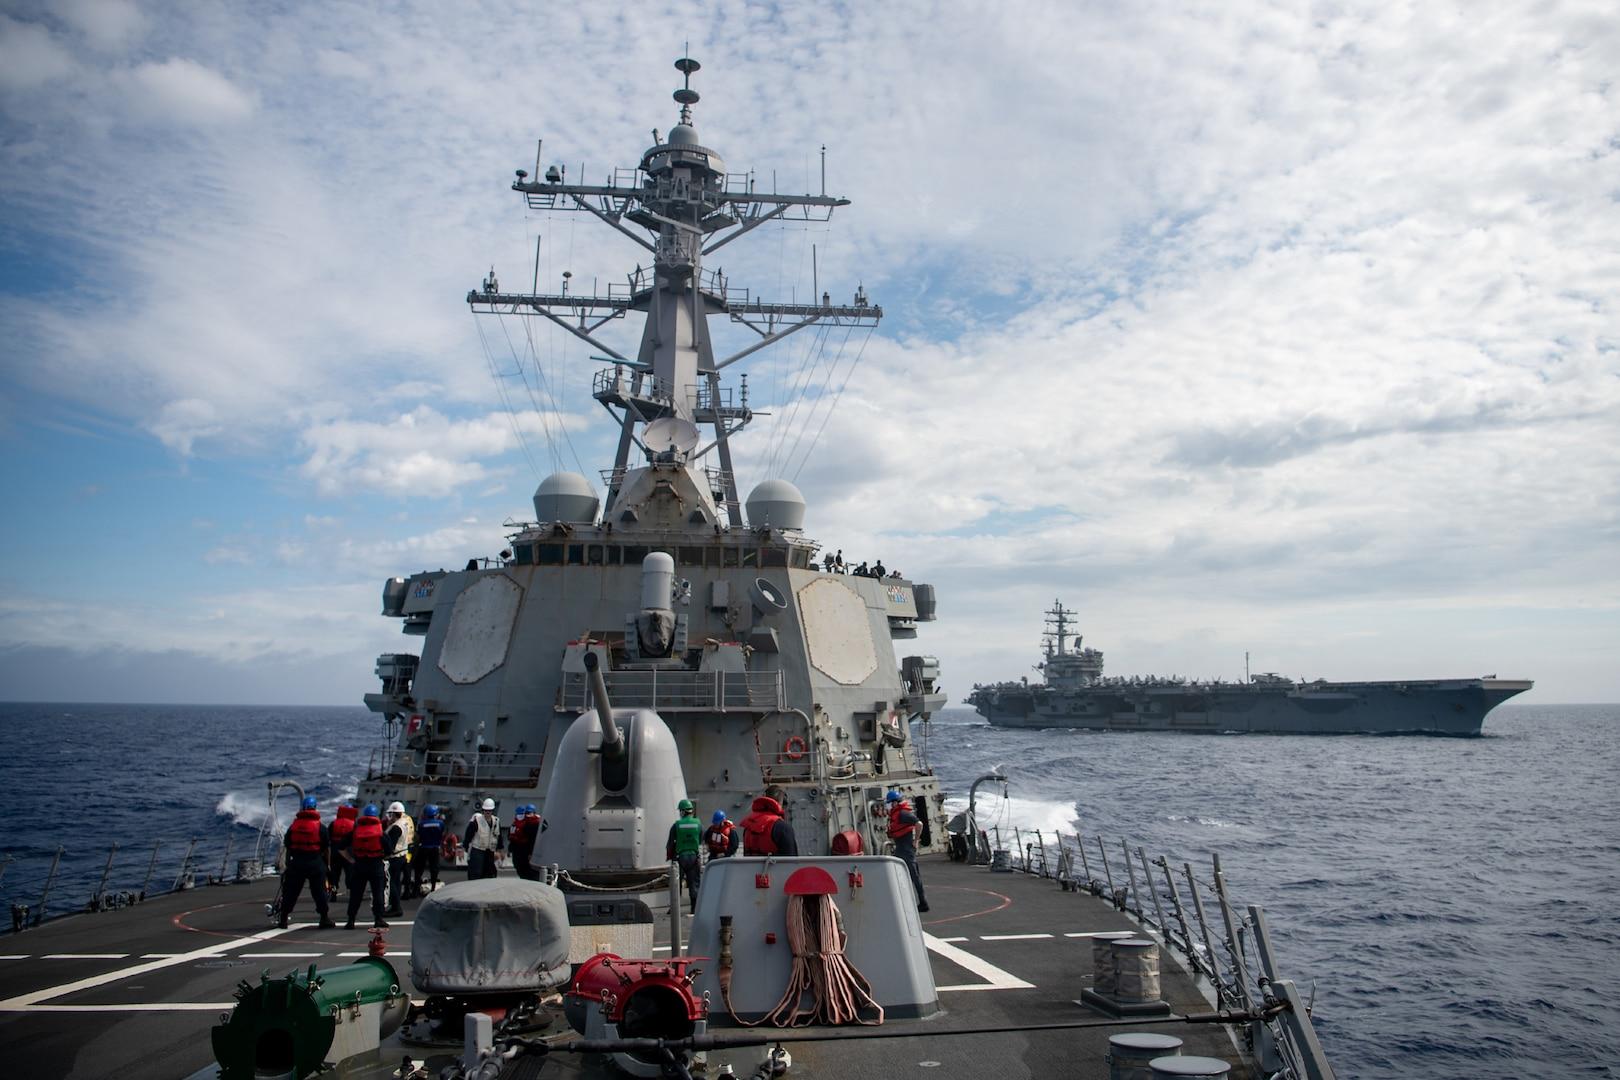 U.S. Navy joins Australia, Japan, Republic of Korea for Multinational Group Sail